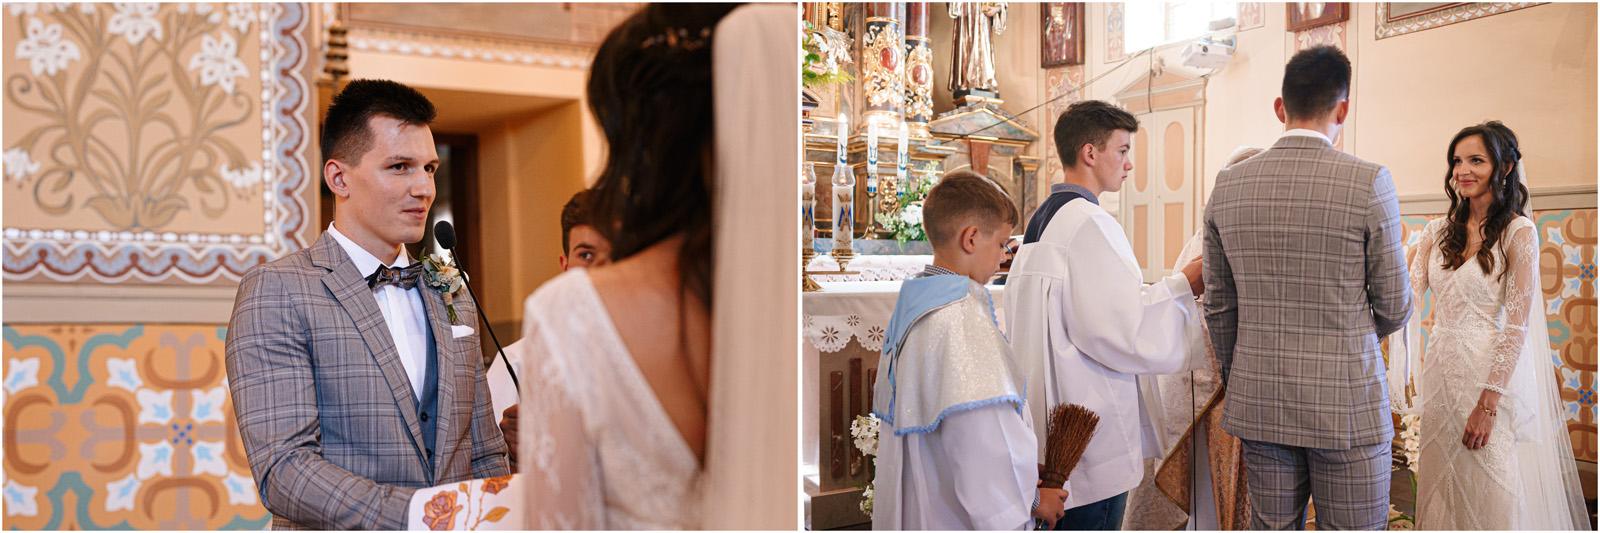 Ania & Mateusz | boho wesele w Stodole pod Kasztanami 44